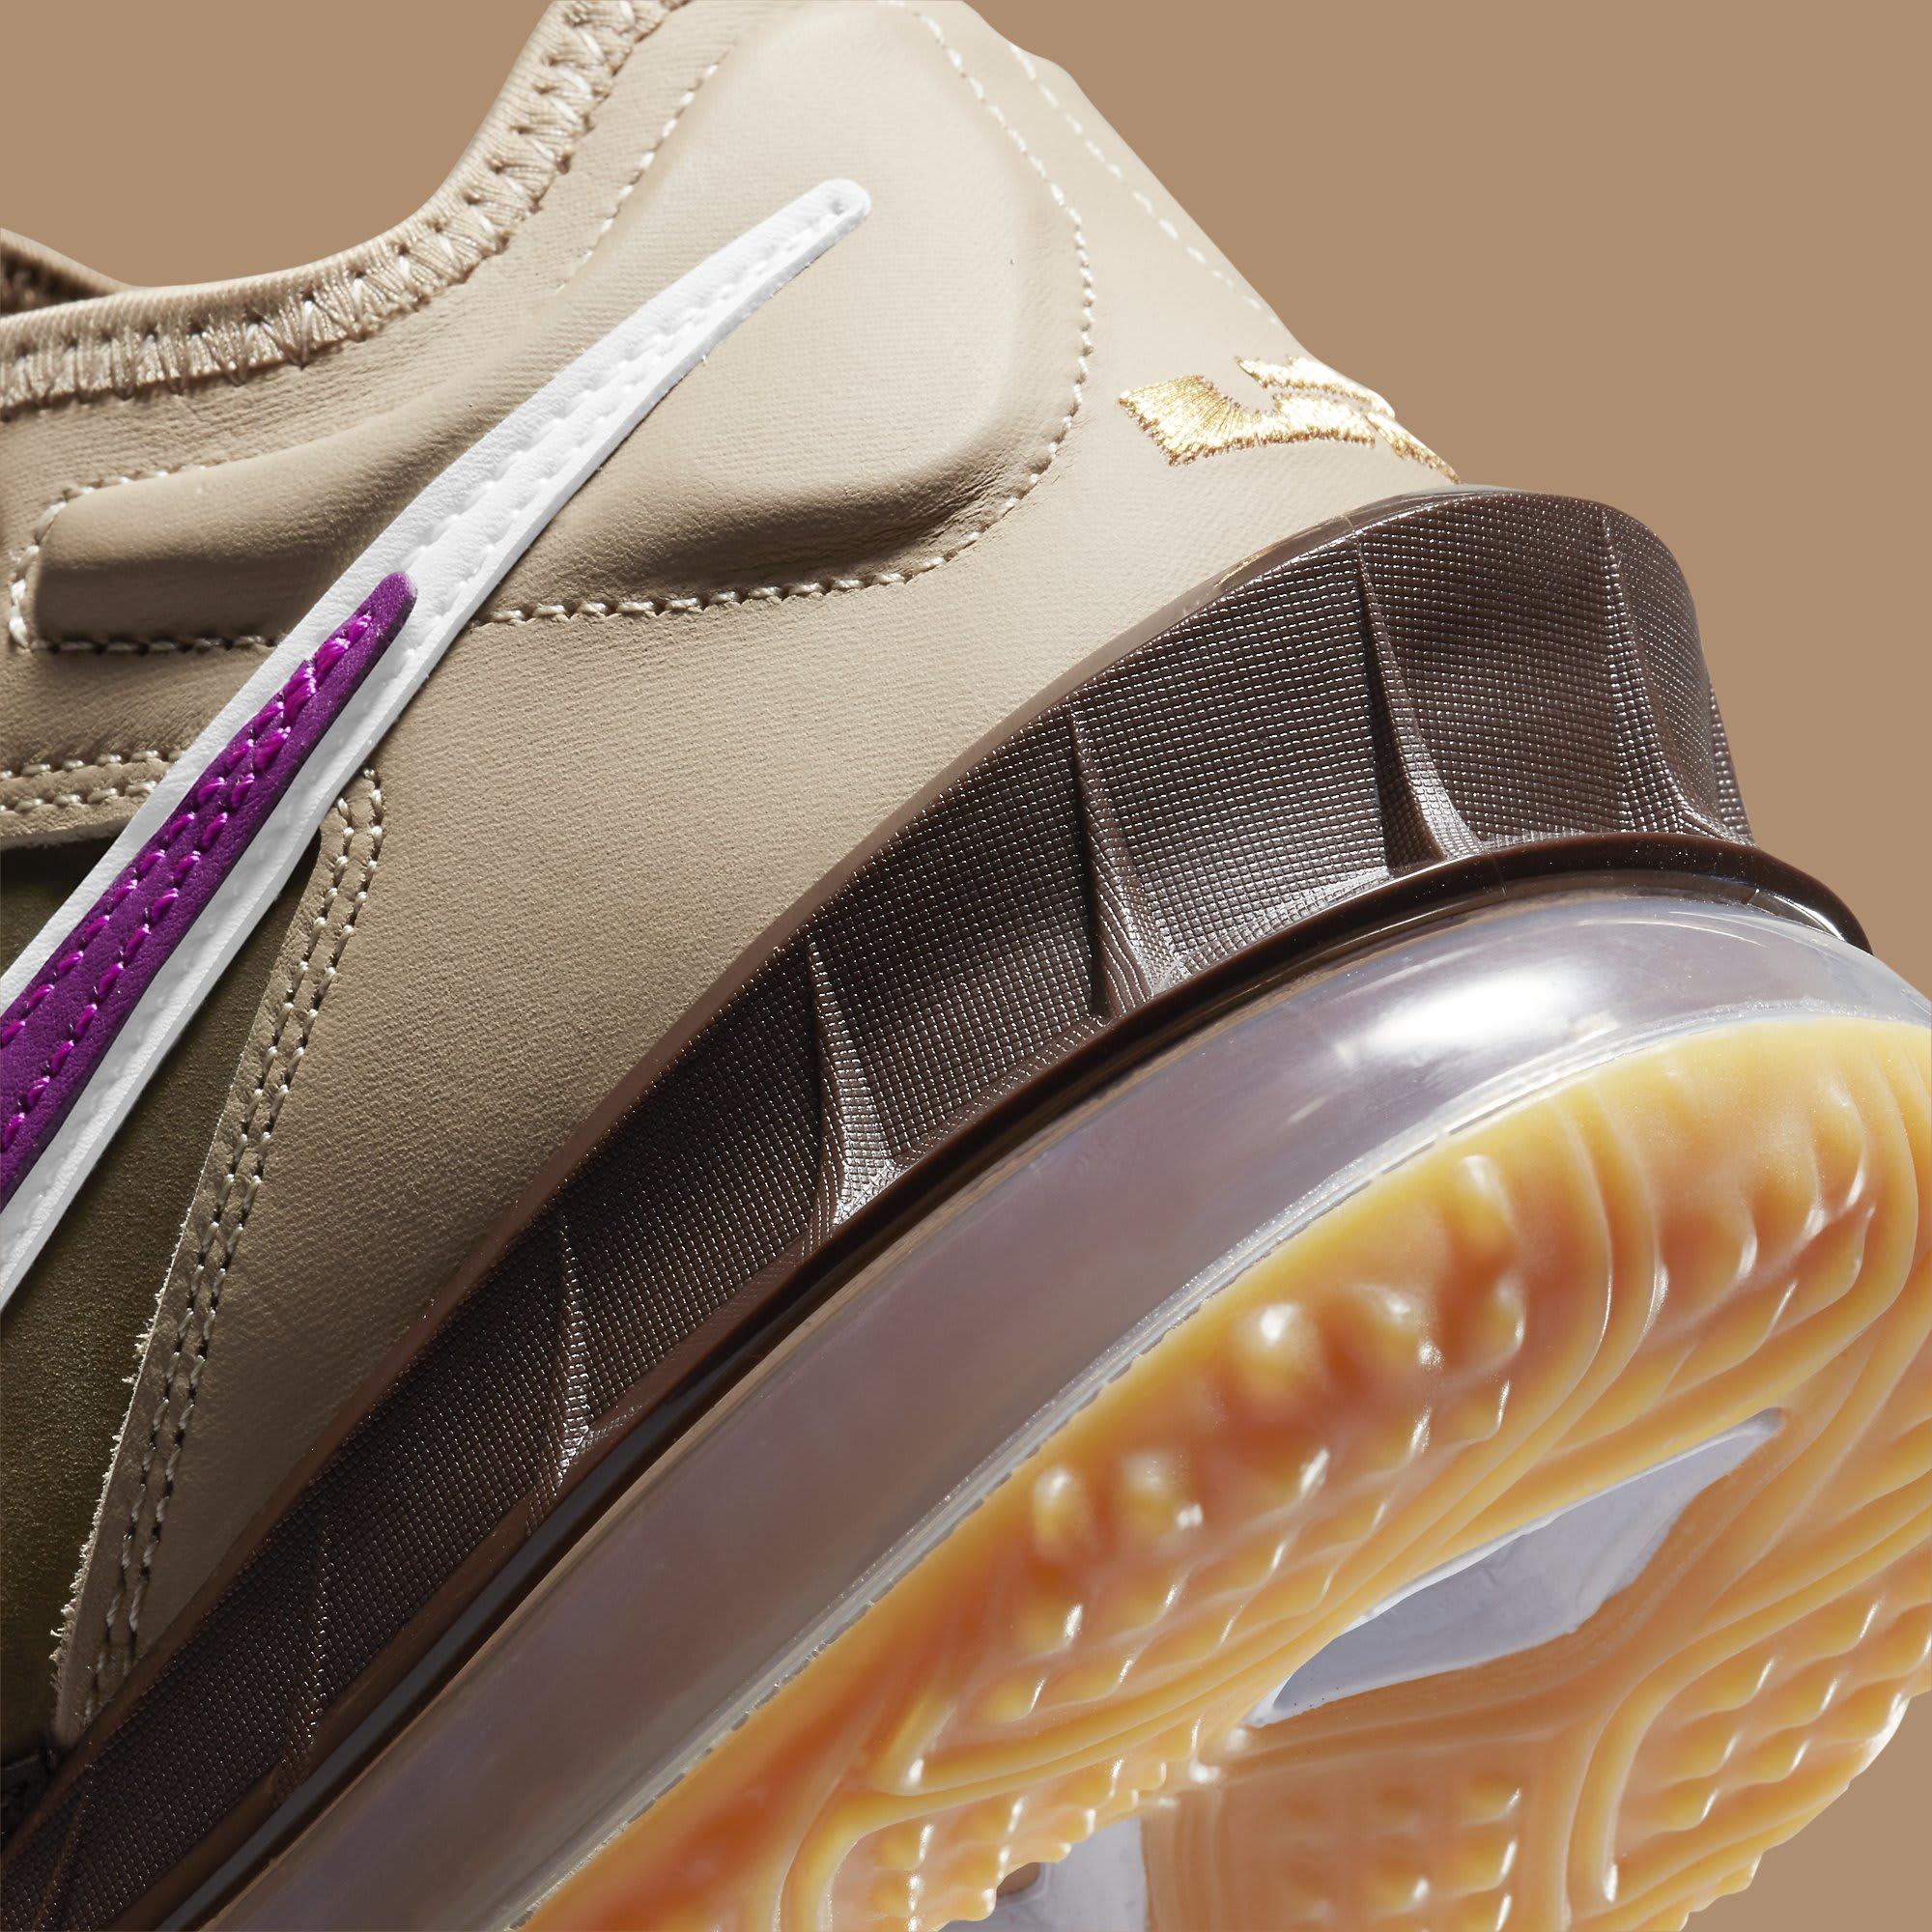 Atmos x Nike LeBron 18 Low 'Viotech' CW5635-200 Heel